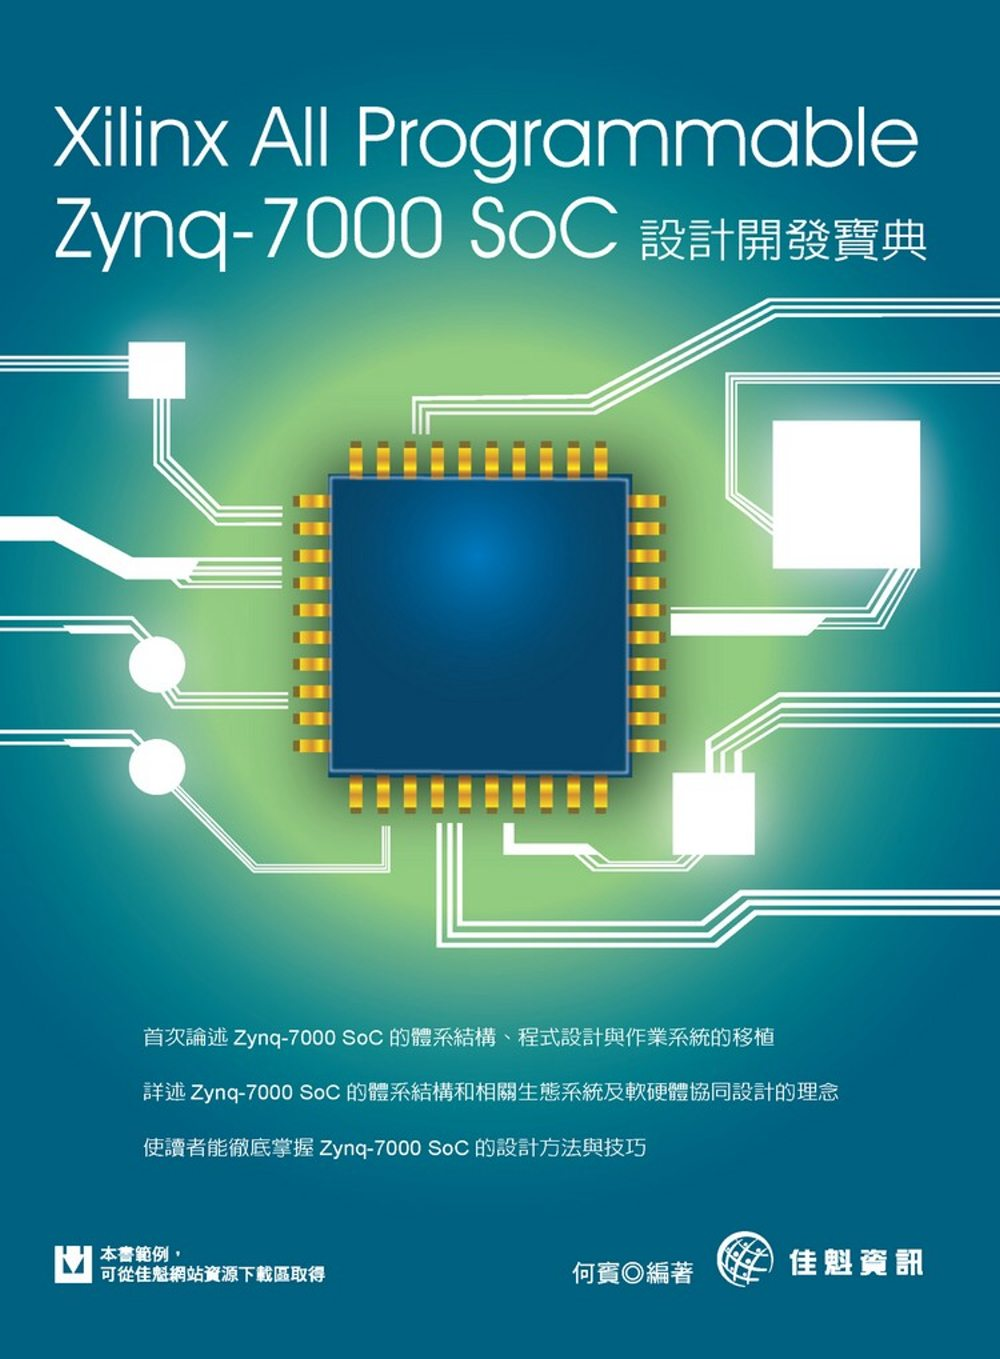 Xilinx All Programmable Zynq-7000 SoC設計開發寶典